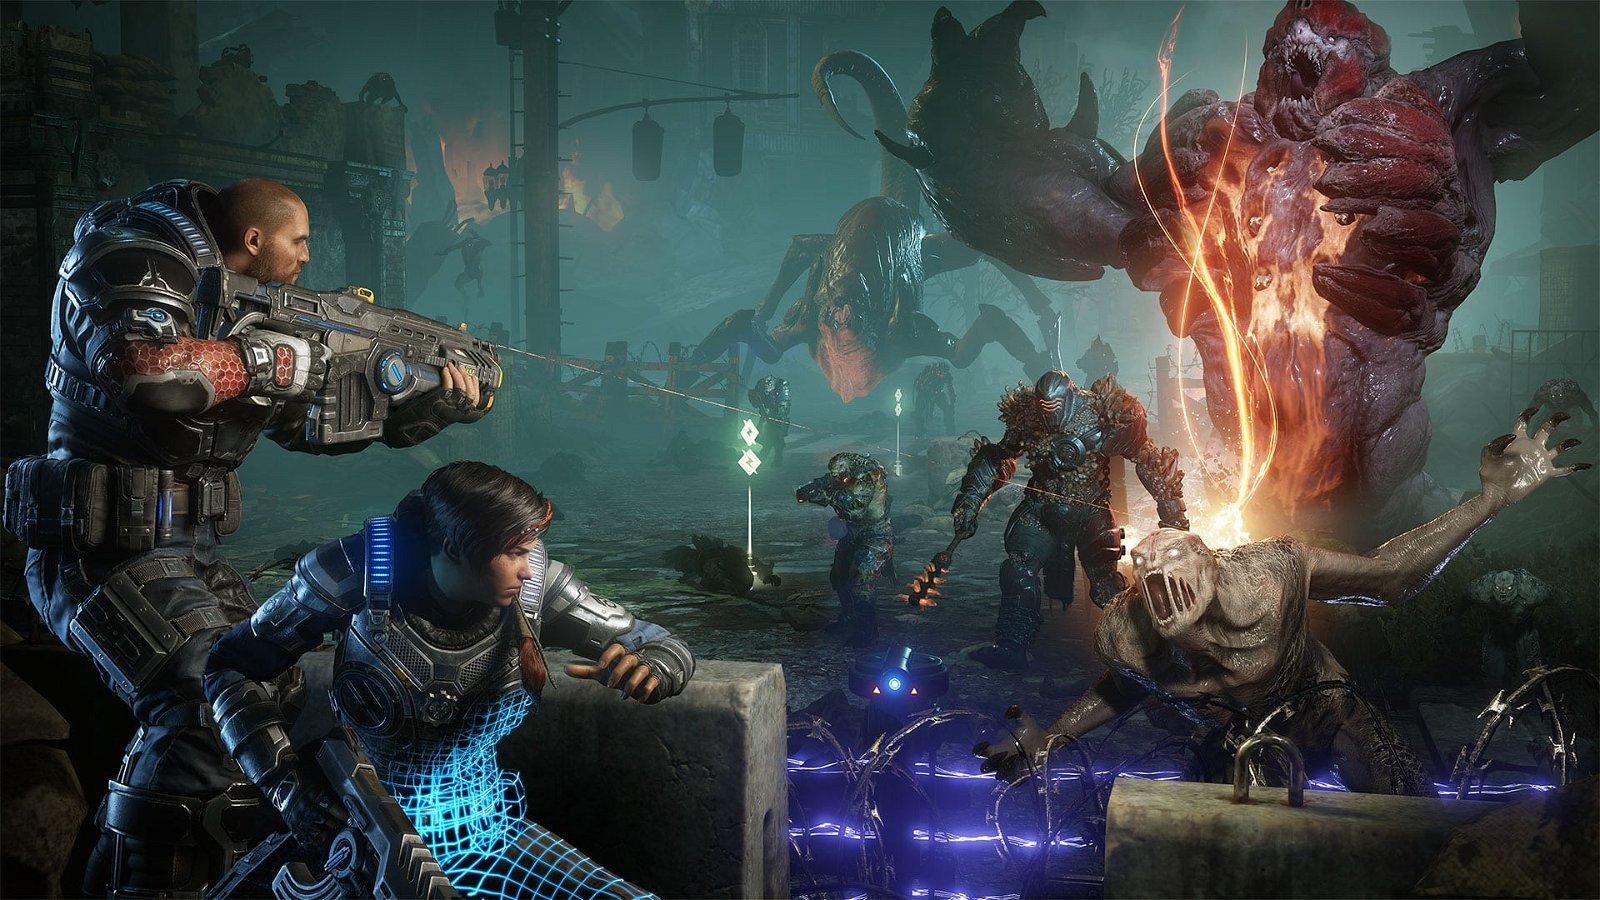 Gears of War 5 Hands-On Preview 5